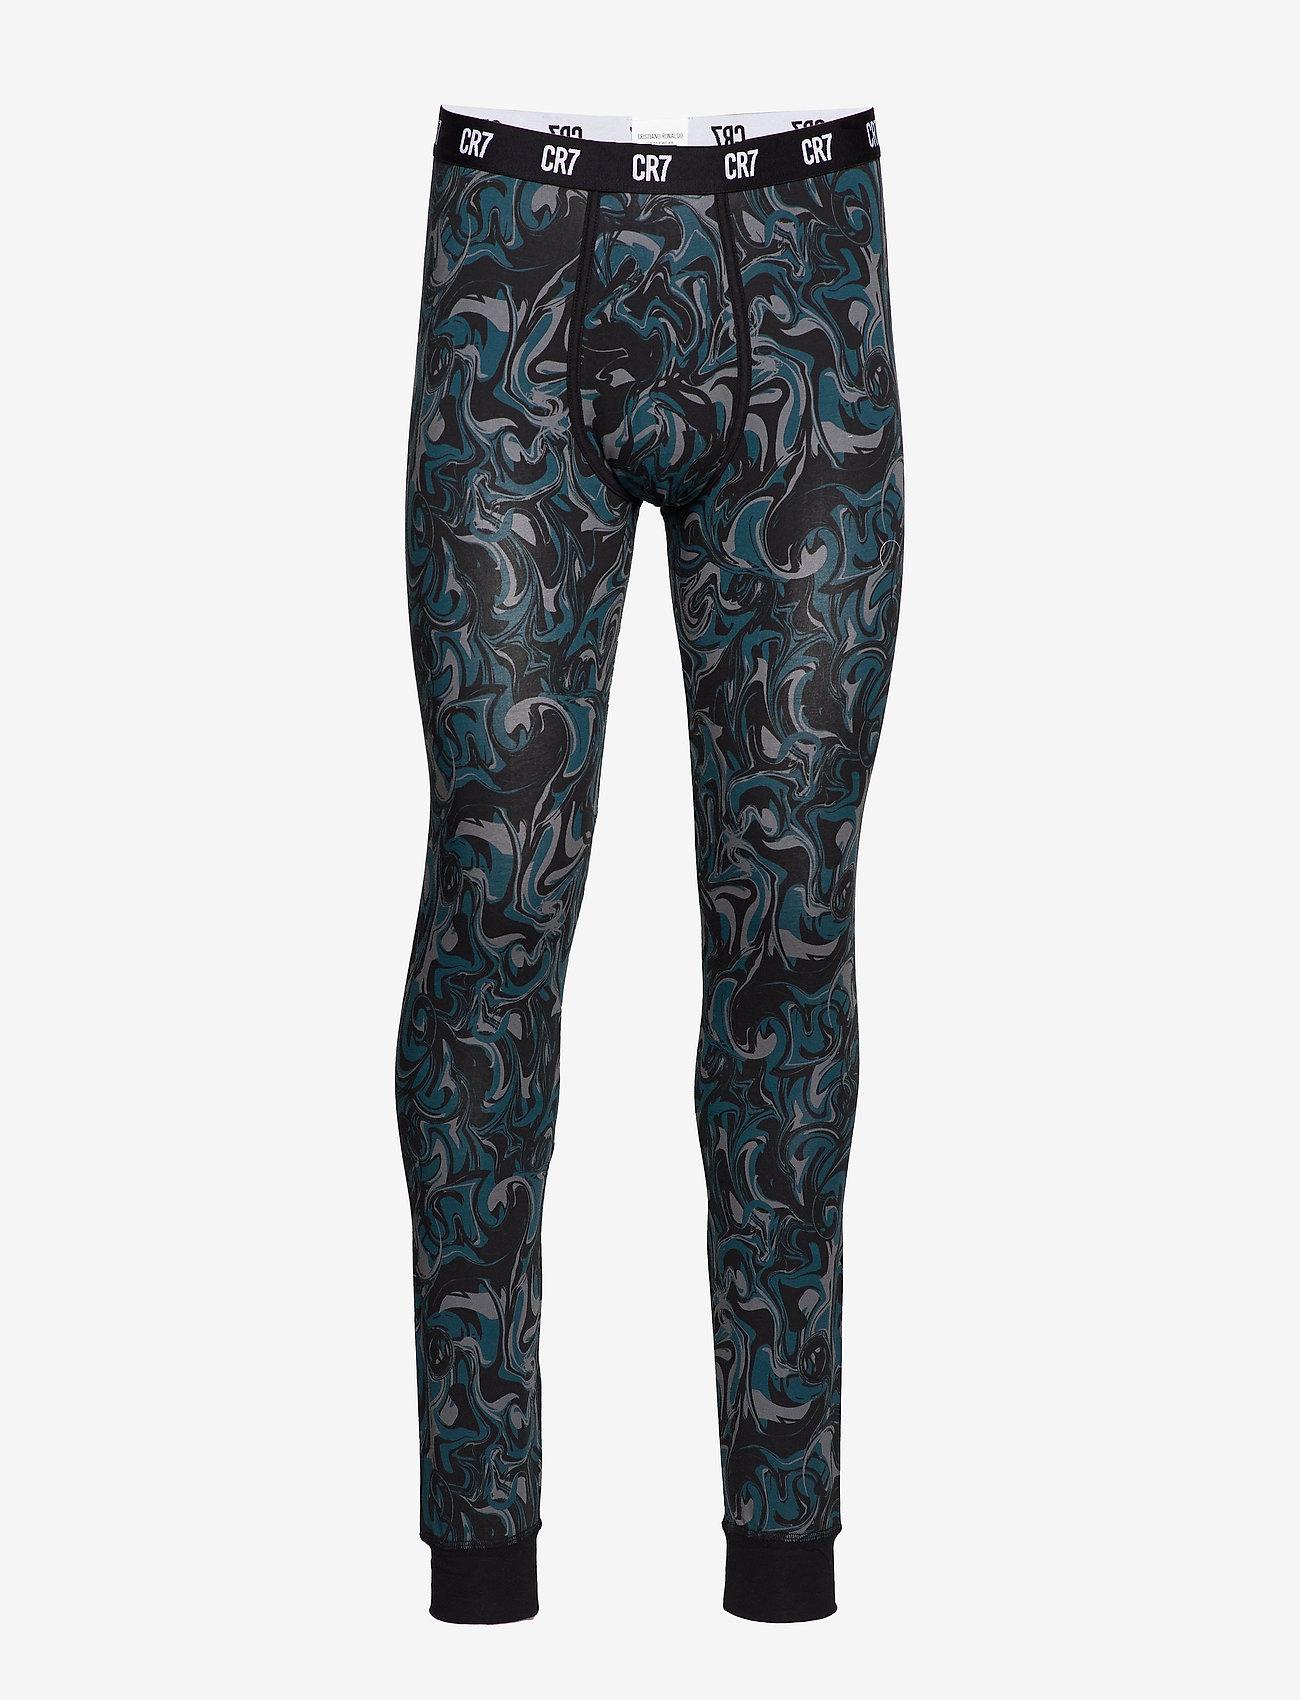 CR7 - CR7 Fashion, Long Johns - bottoms - multicolou - 0